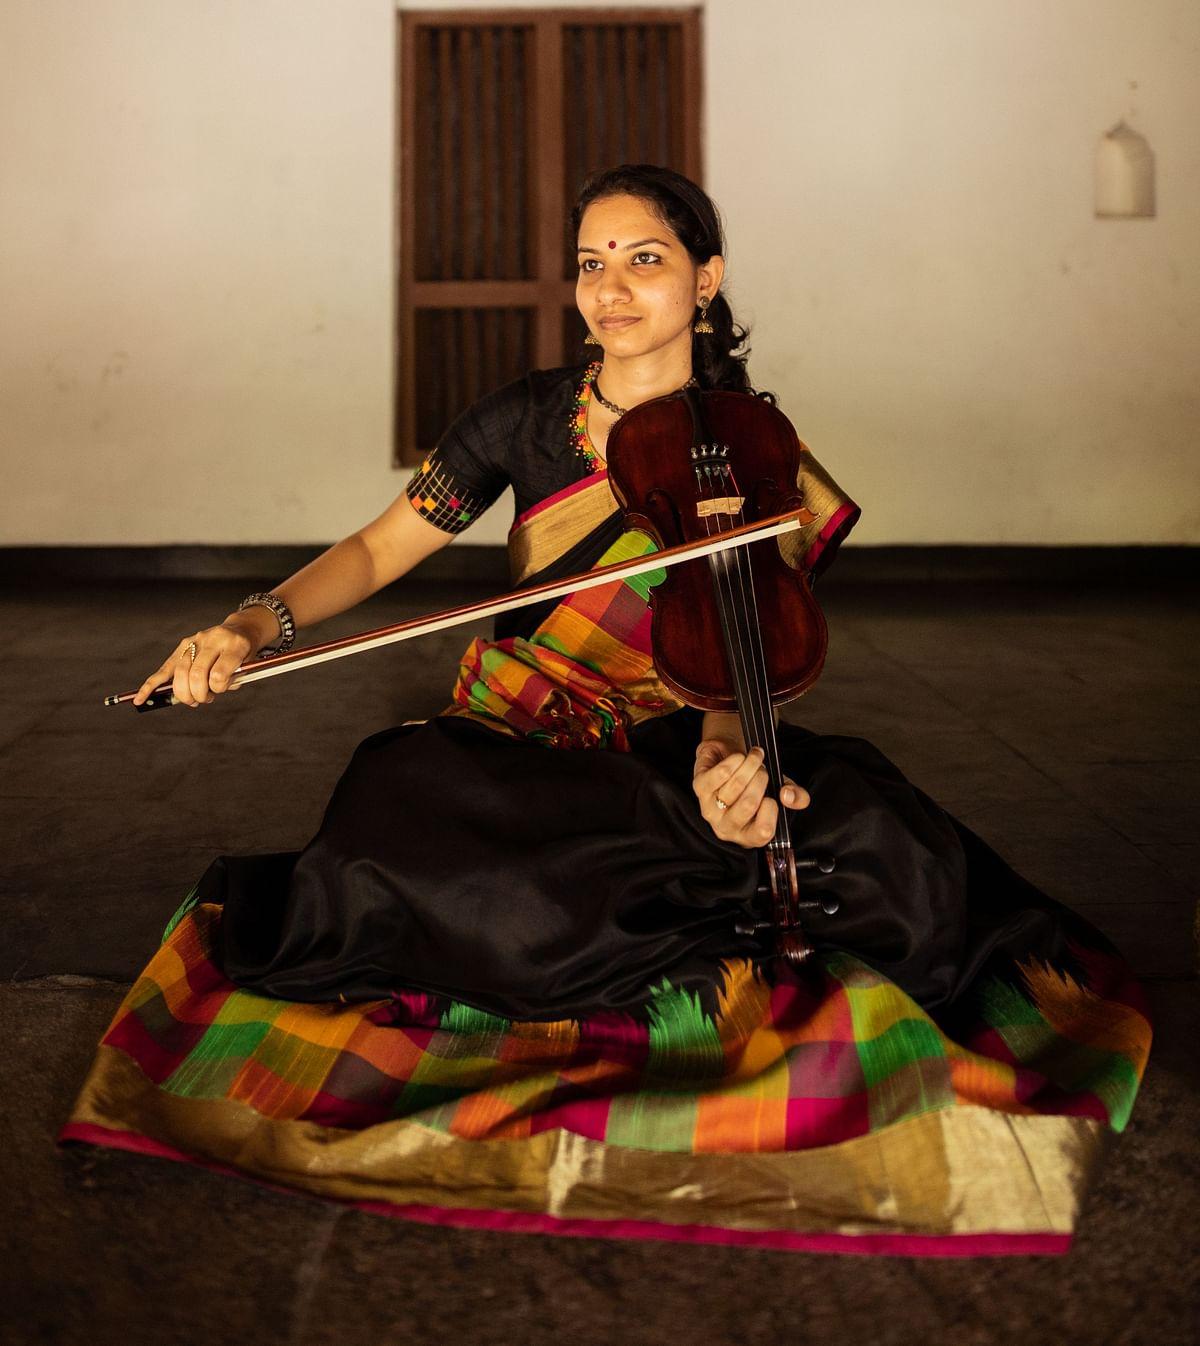 Meet the violinist, Shreya Devnath